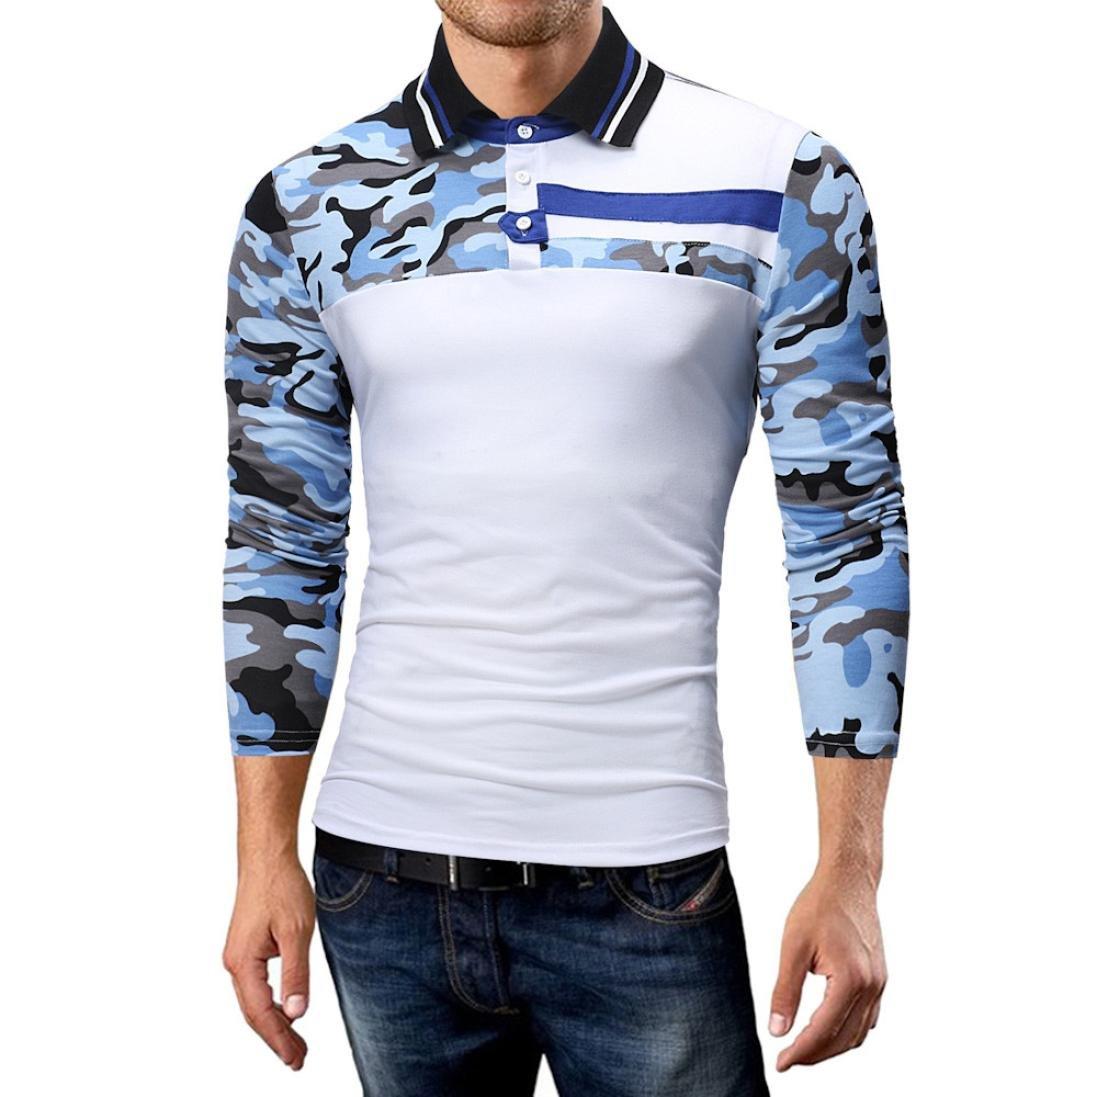 Goddessvan 2018 Men's Autumn Casual Slim Long Sleeve Camouflage T Shirt Top Blouse(White,L)